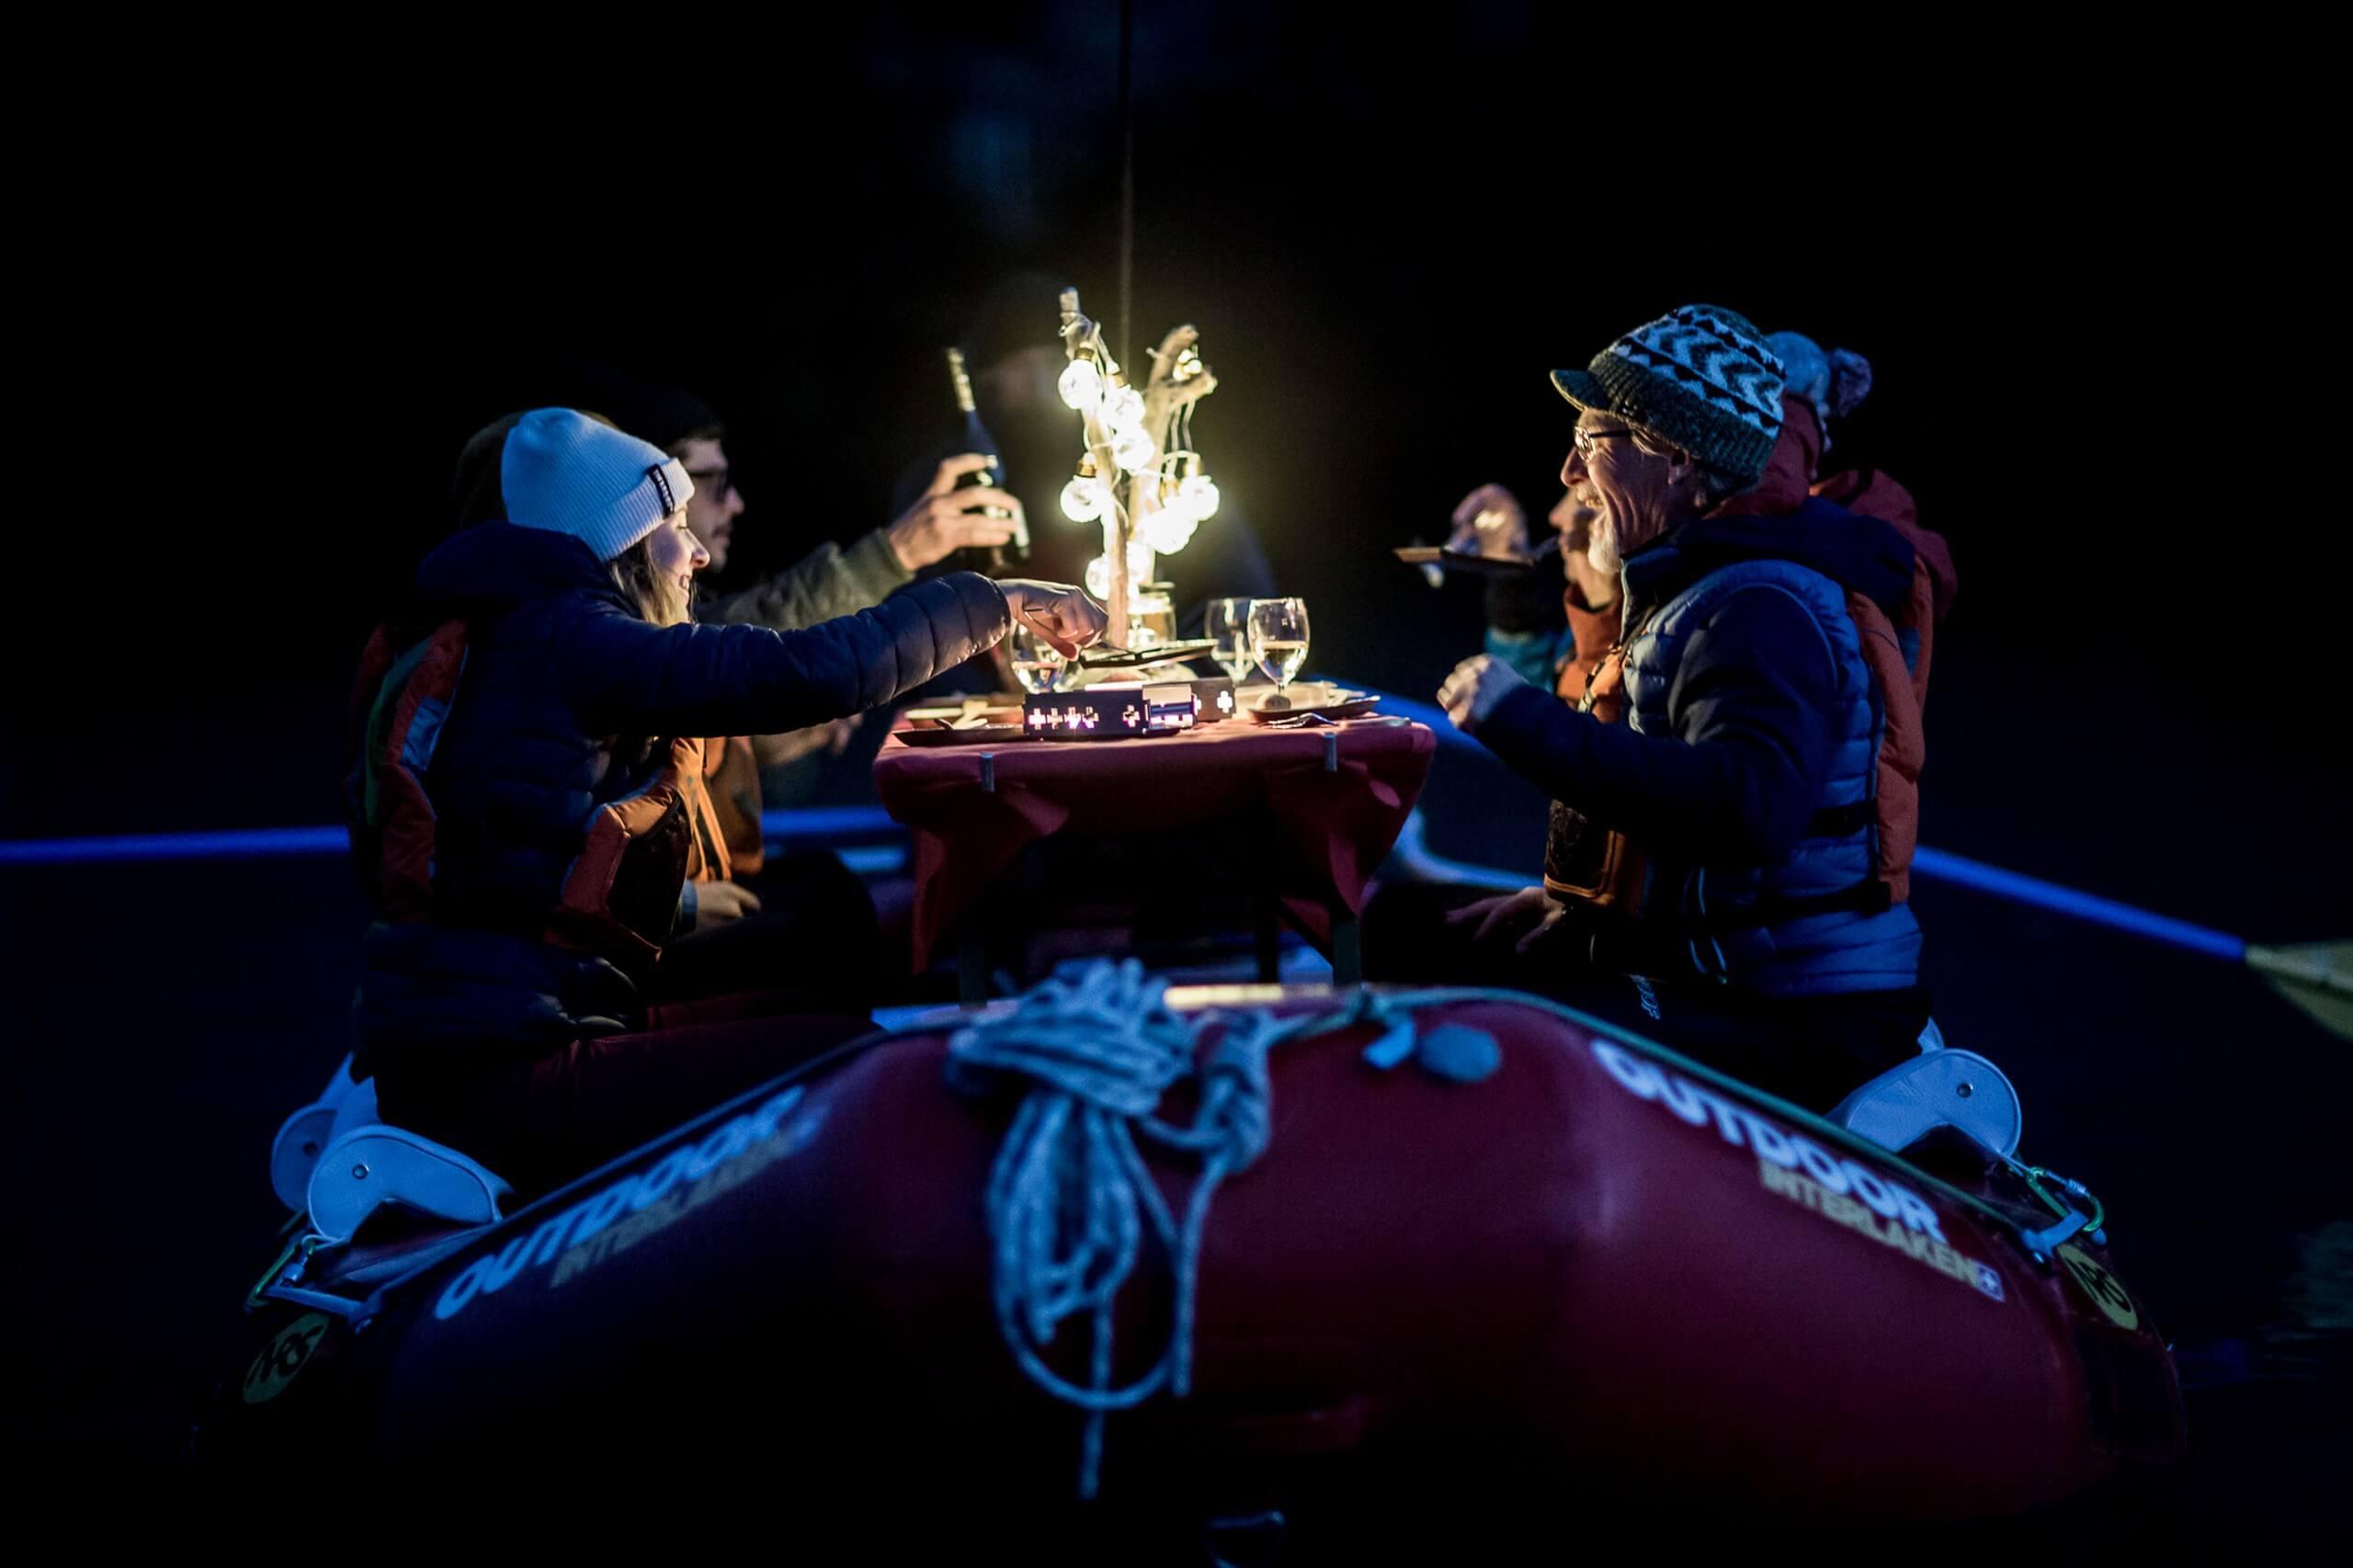 raclette-rafting-outdoor-interlaken-chillipictures-vorne.jpg